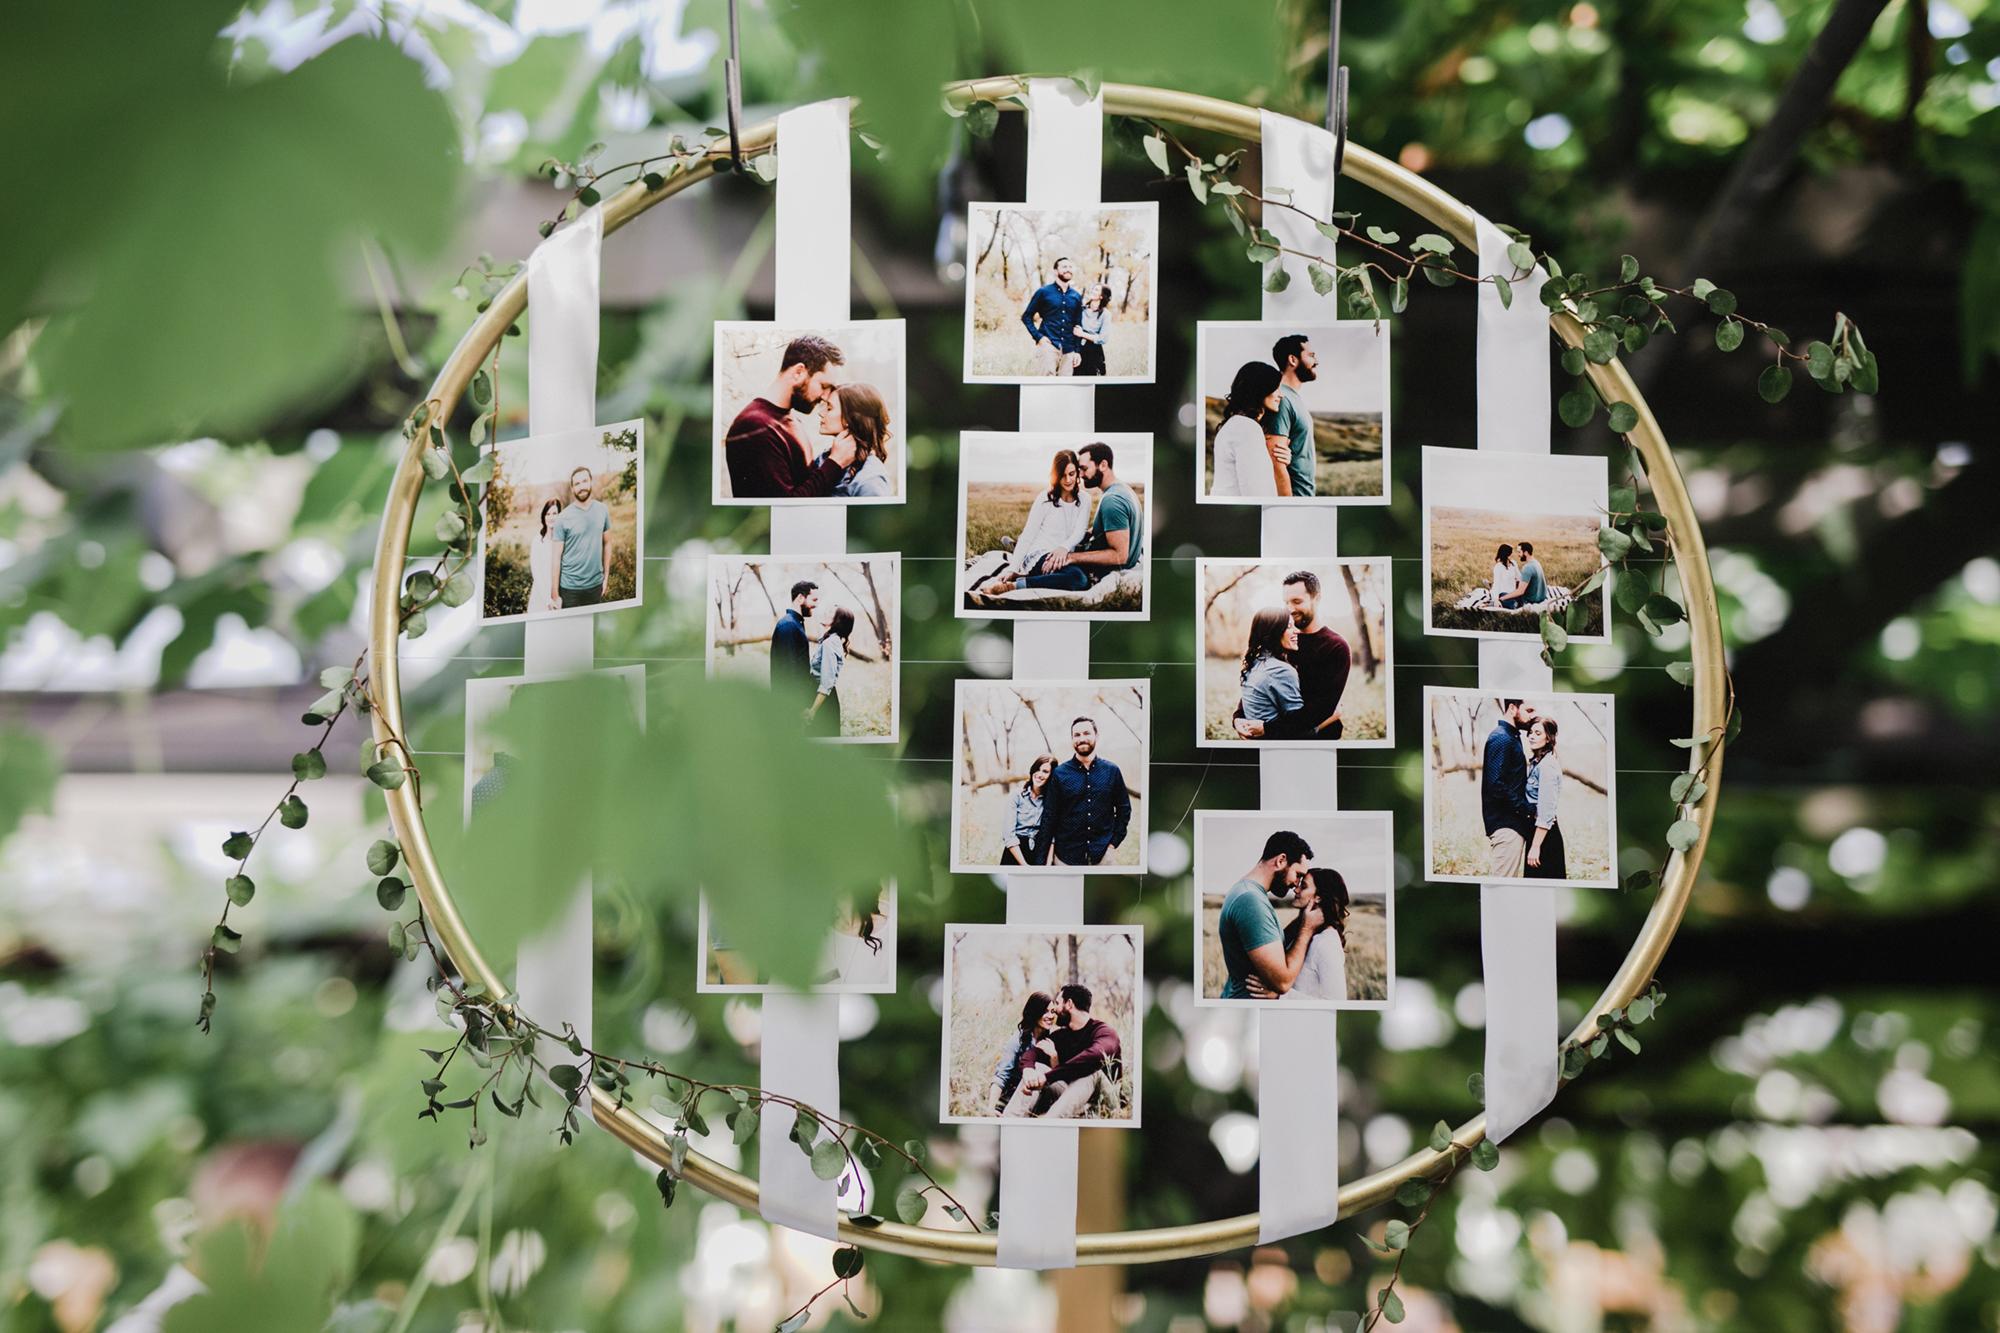 Flower Farm Crowsnest Pass Wedding -066.JPG